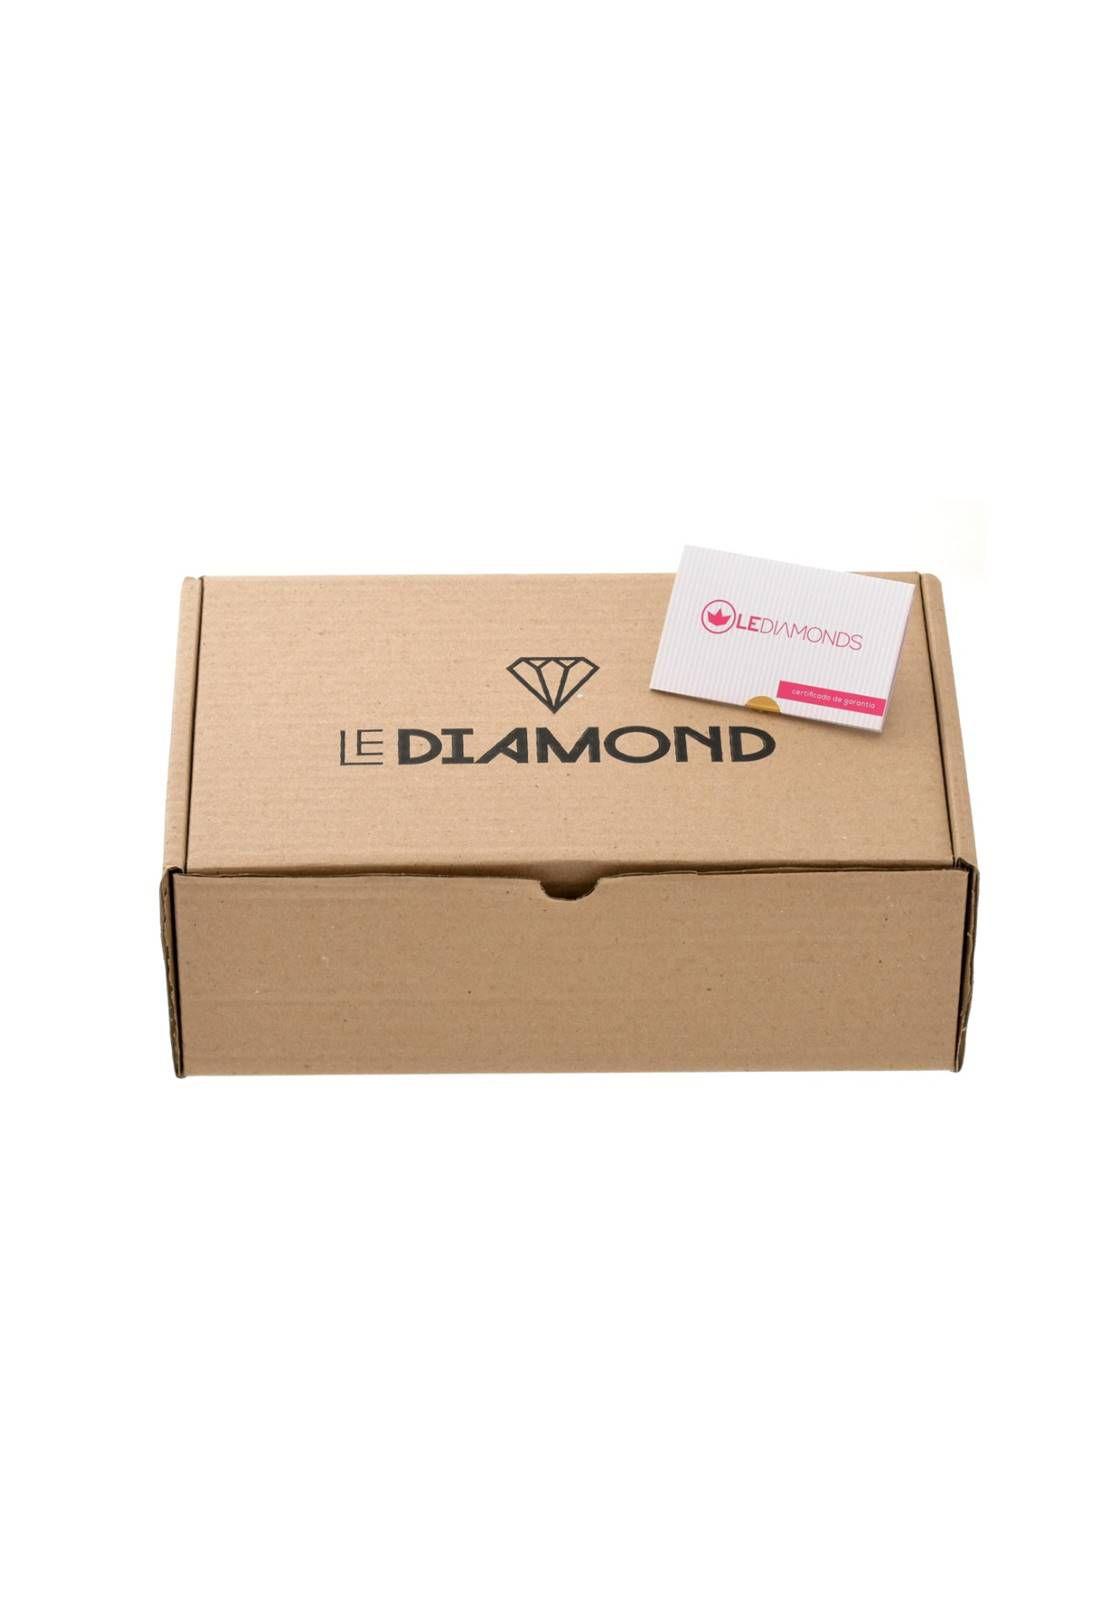 Brinco Le Diamond Concha Natural com Fios de Seda Verde